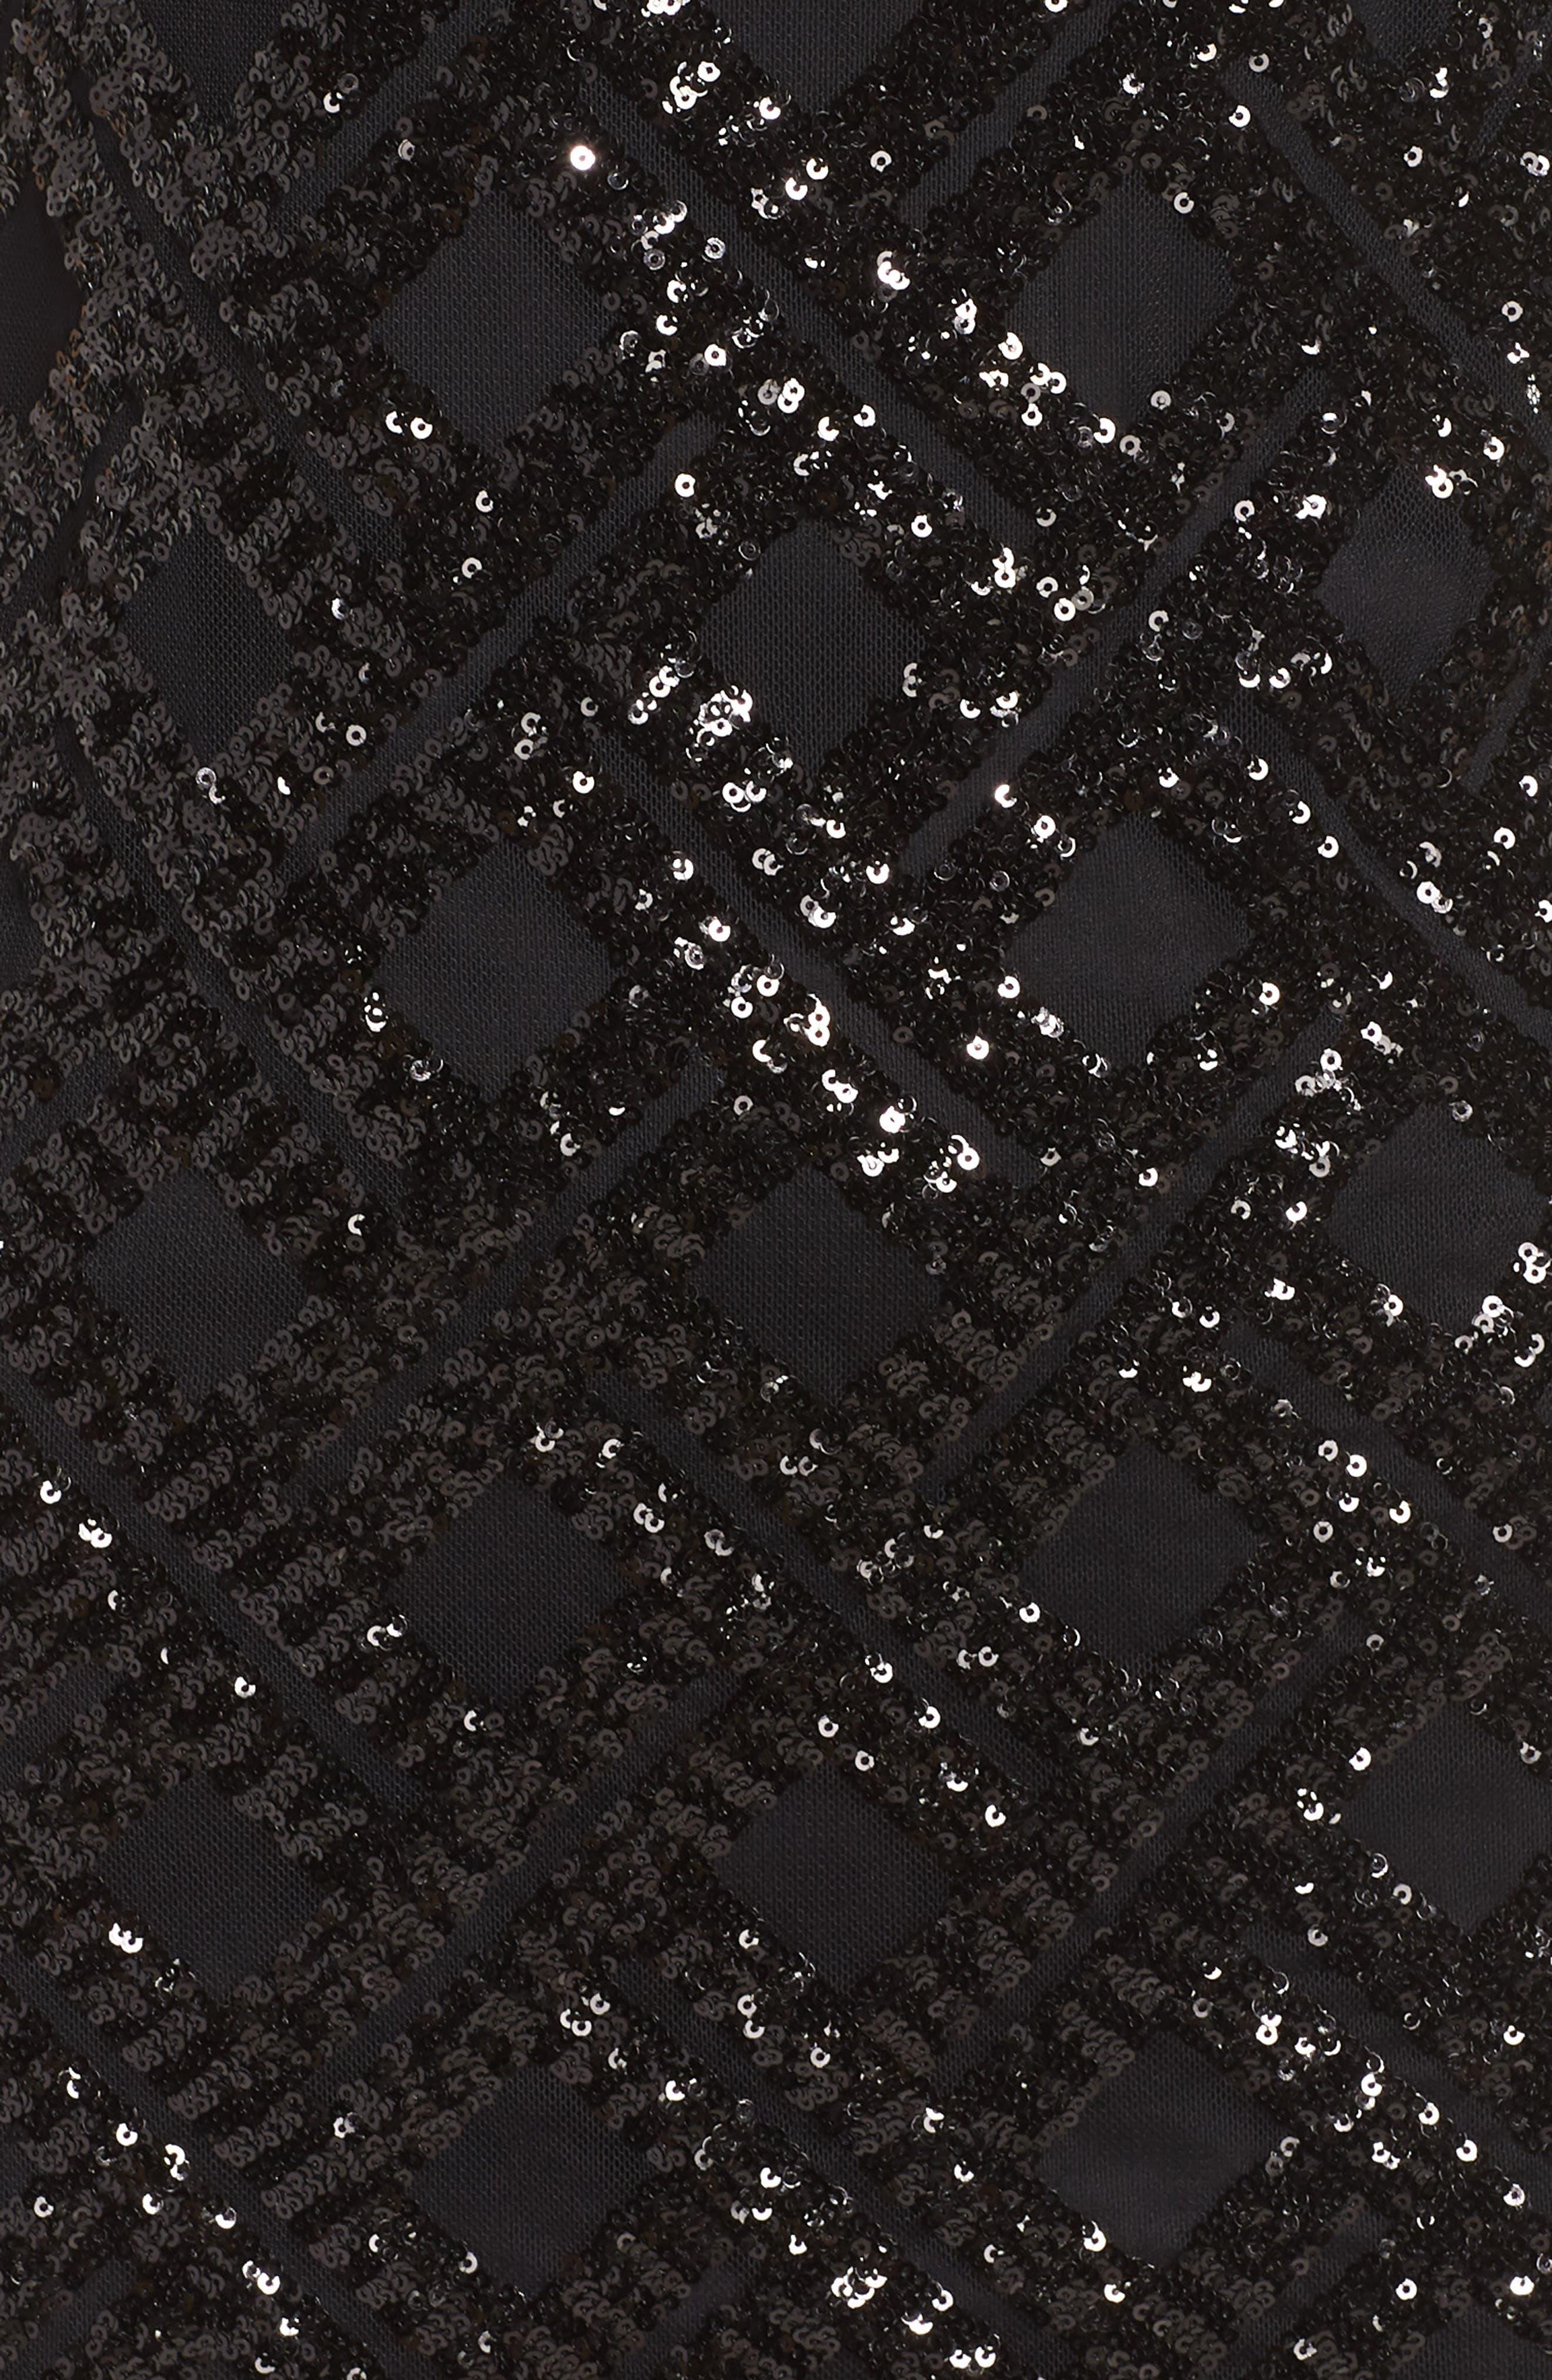 Sequin Sheath Dress,                             Alternate thumbnail 6, color,                             BLACK